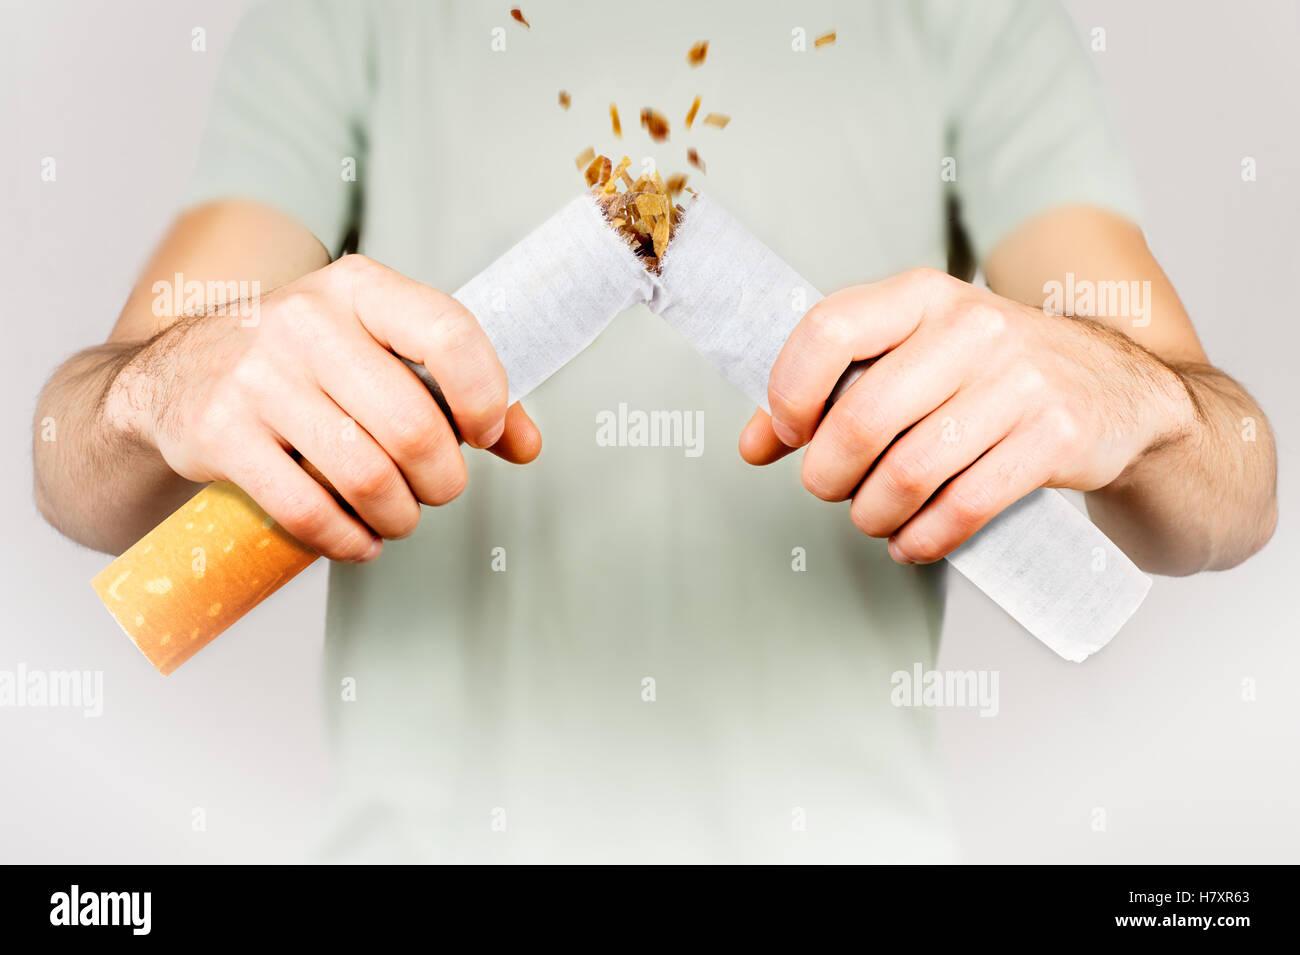 Quit smoking - male smoker breaking giant cigarette - Stock Image